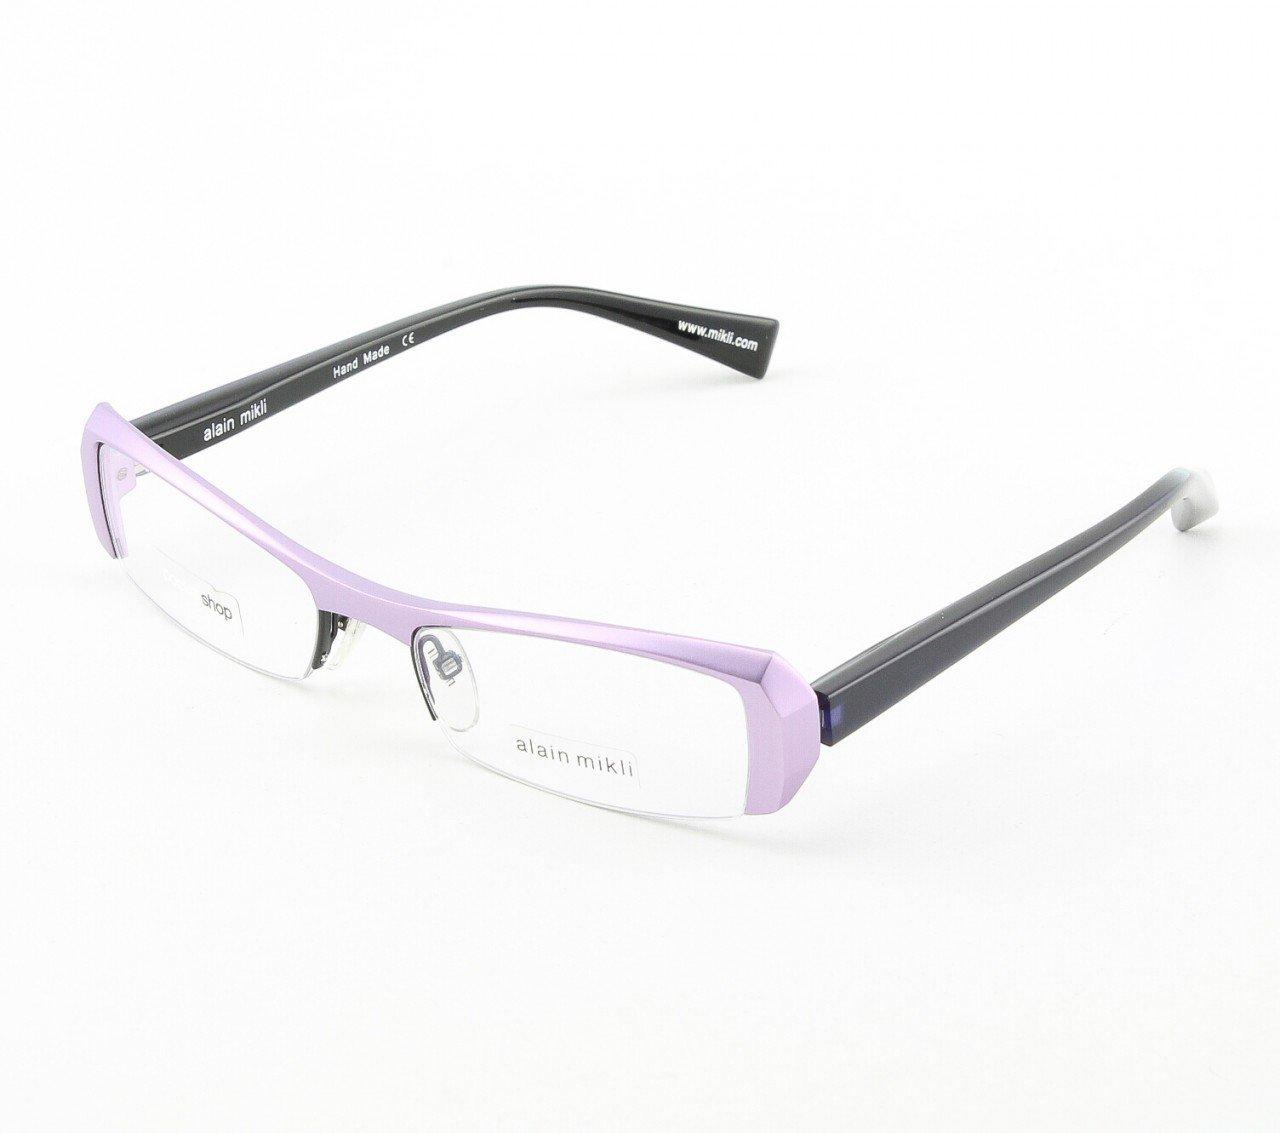 Alain Mikli Eyeglasses AL0613 Col. 11 Lavendar Metallic Frame with Deep Purple Temples